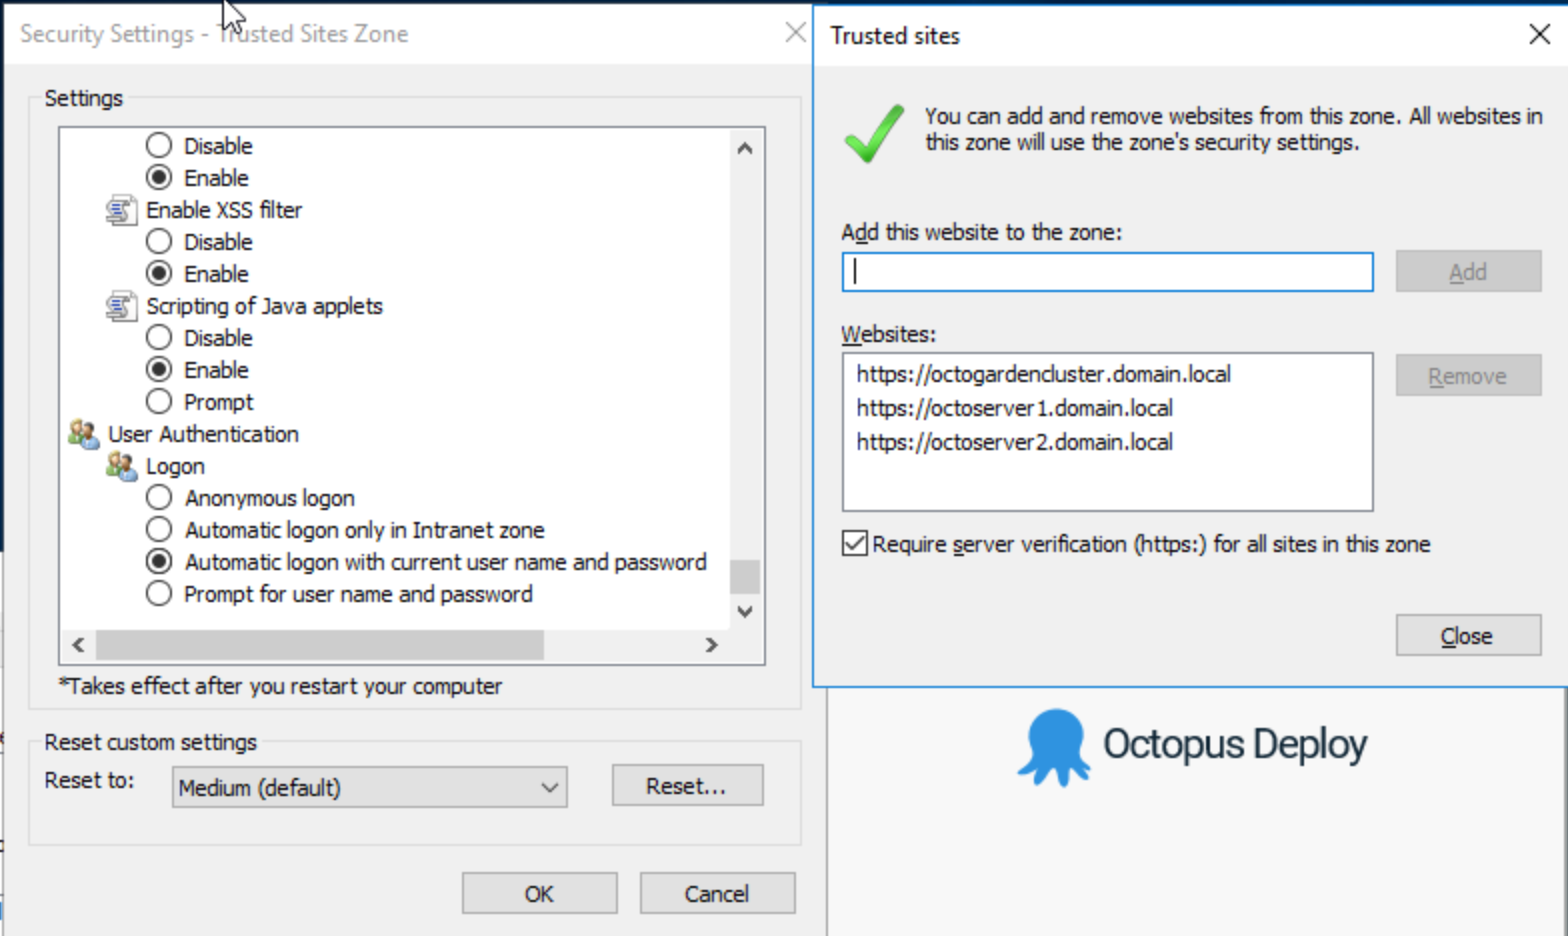 Client Security